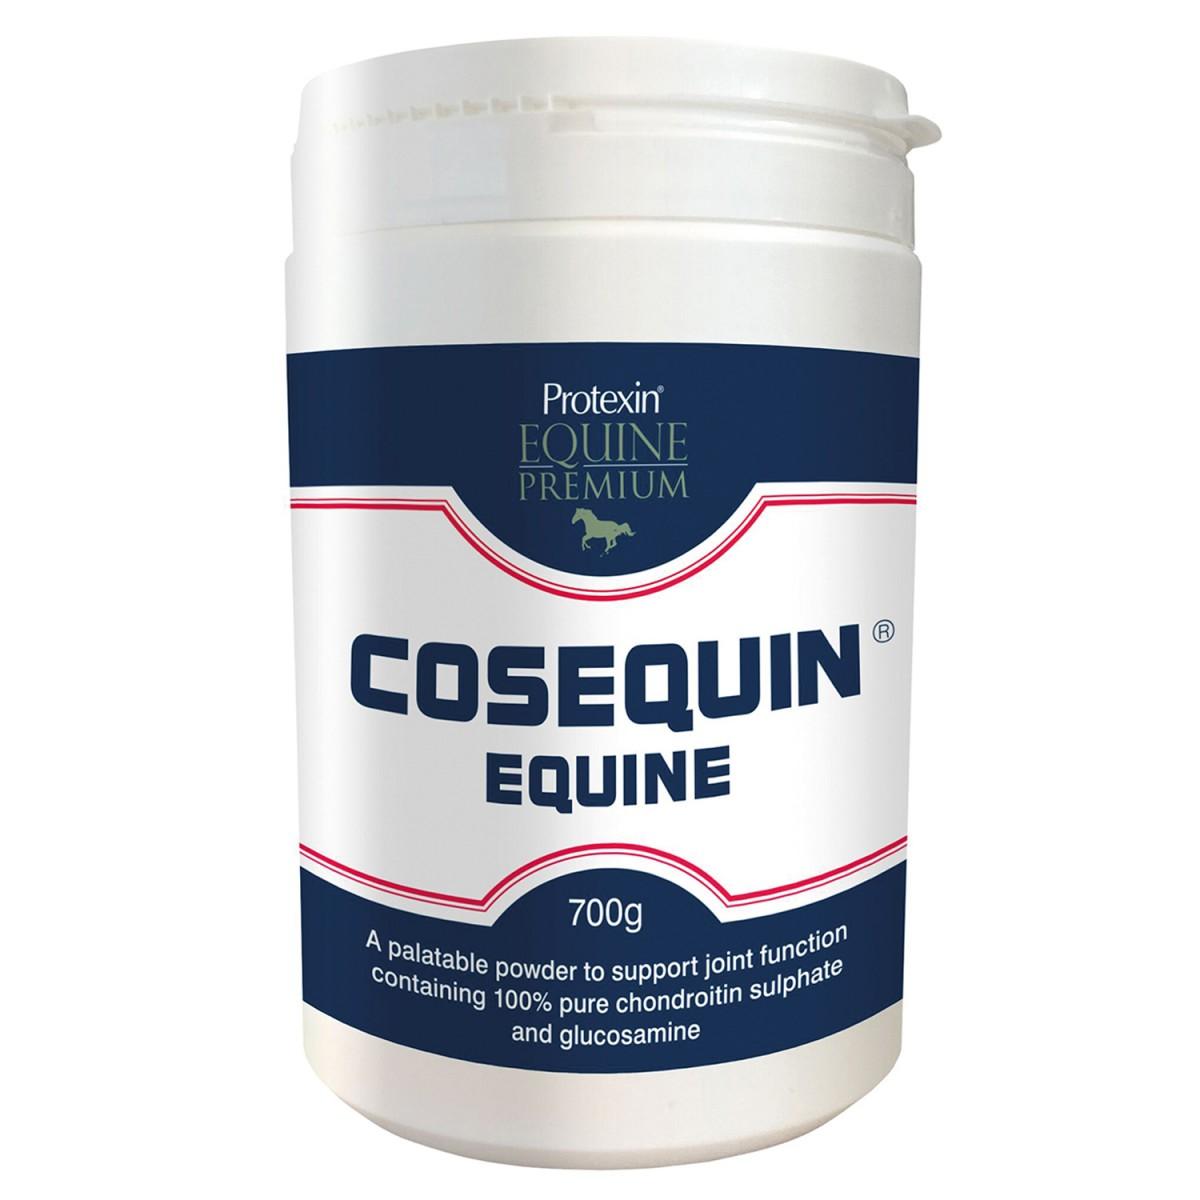 Protexin Cosequin Equine